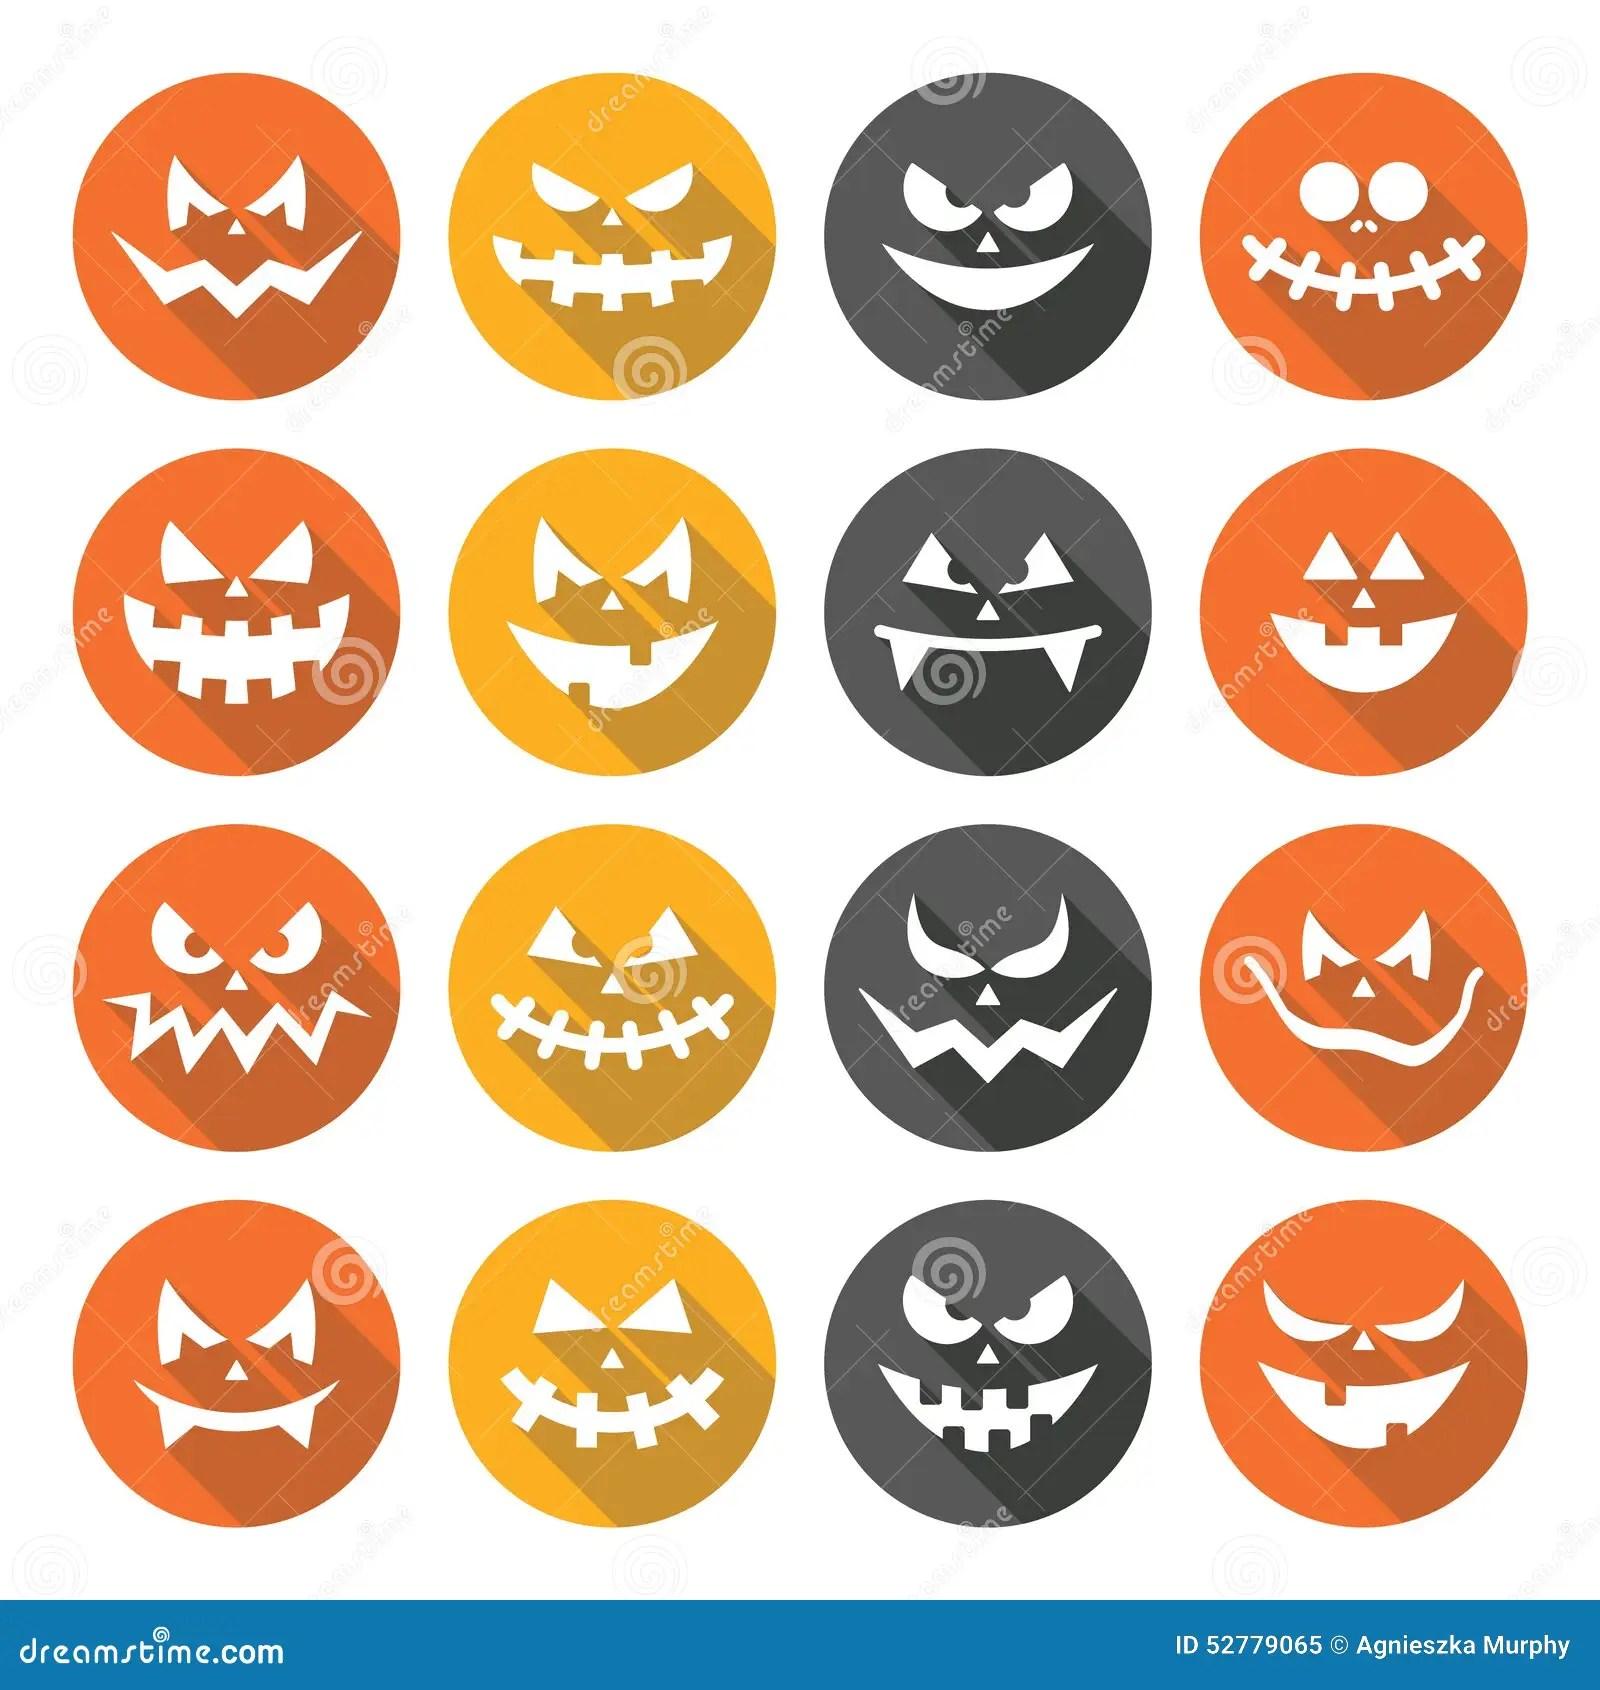 Scary Halloween Pumpkin Faces Flat Design Icons Set Stock